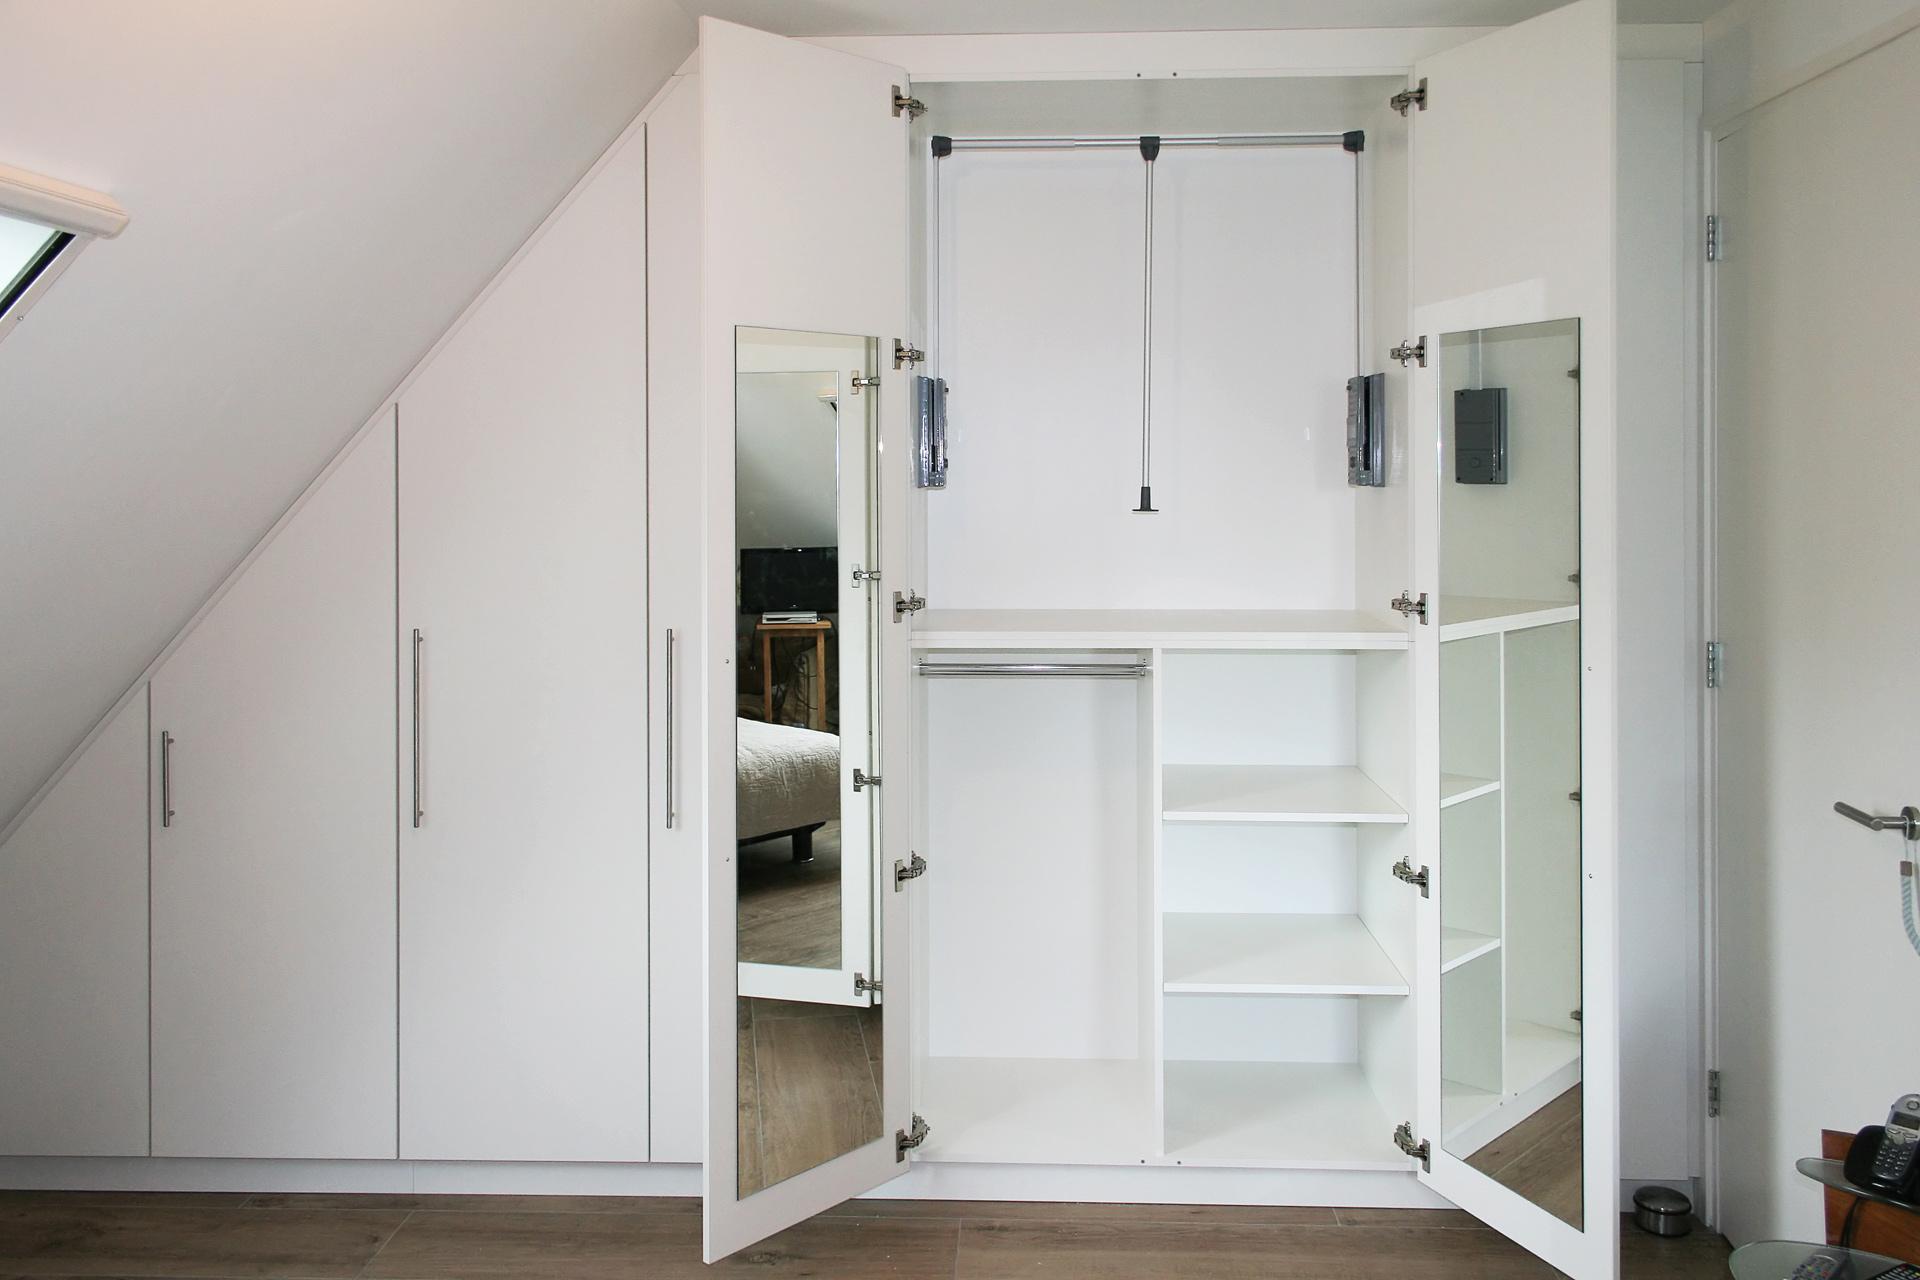 Kledingkast onder een schuine kap erjo maatwerk interieur - Kledingkast en dressoir ...